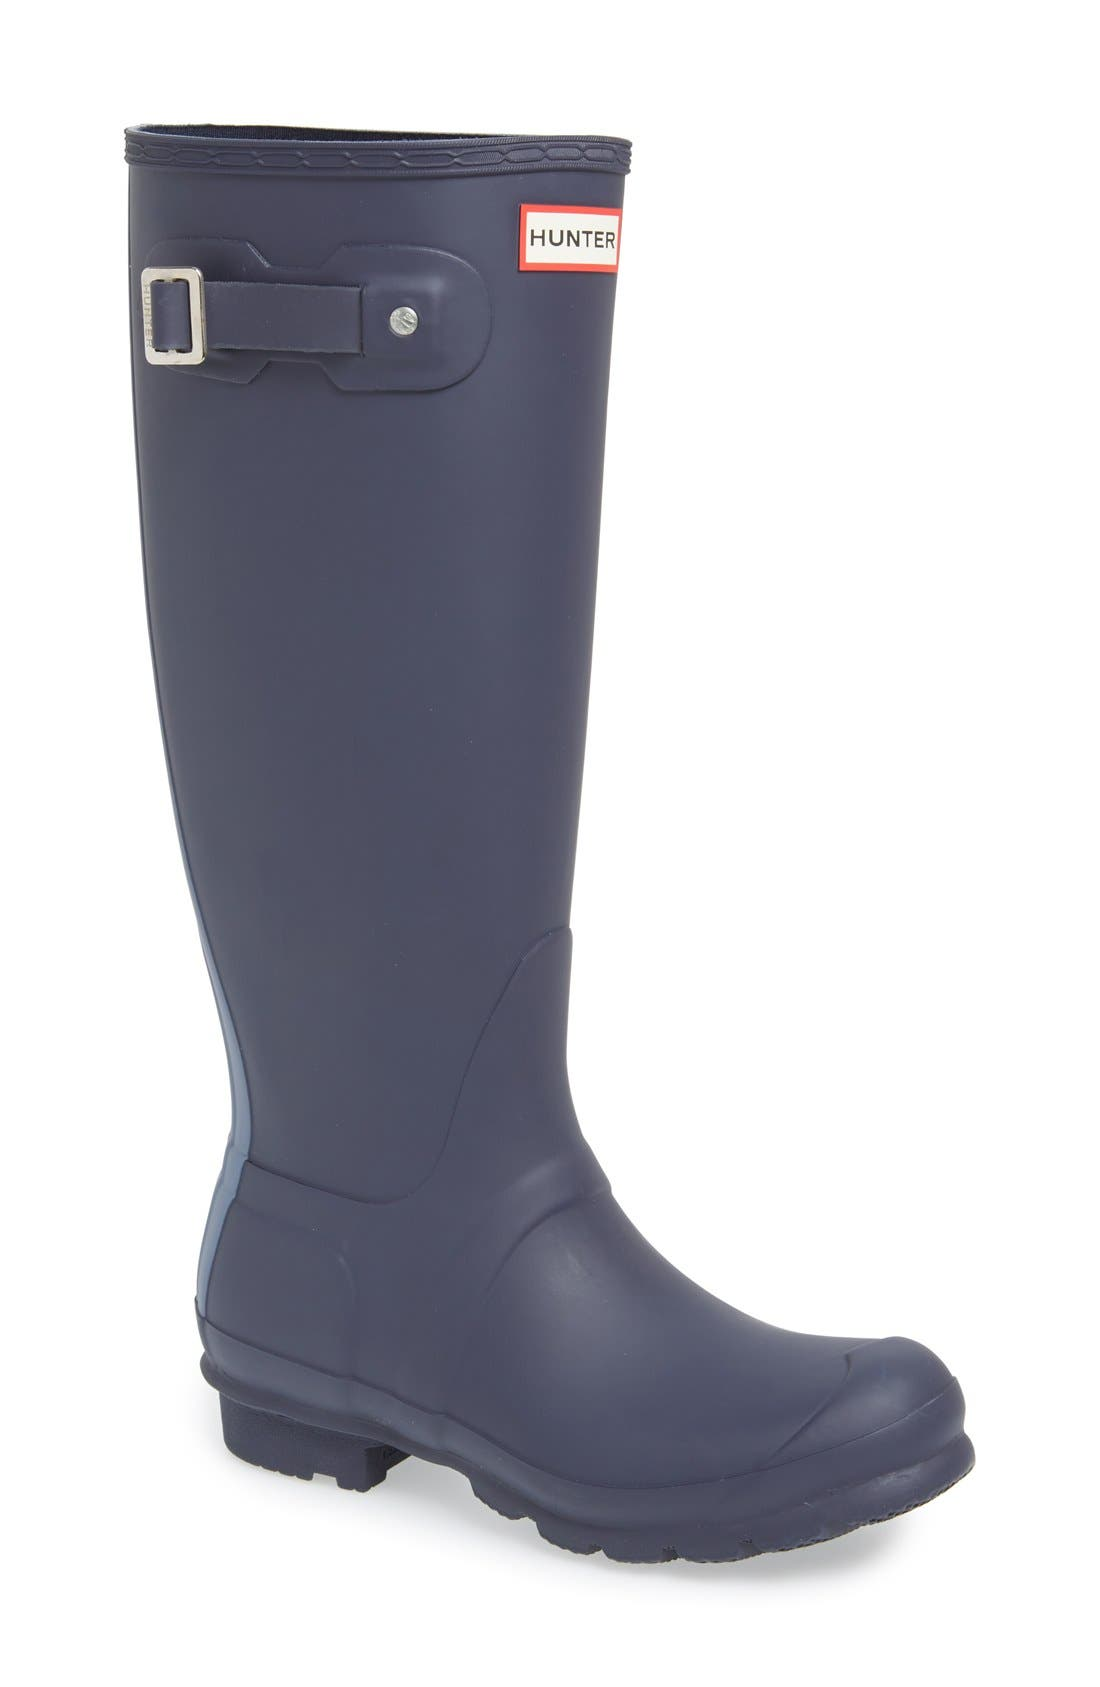 Alternate Image 1 Selected - Hunter 'Original Stripe' Waterproof Rubber Boot (Women)